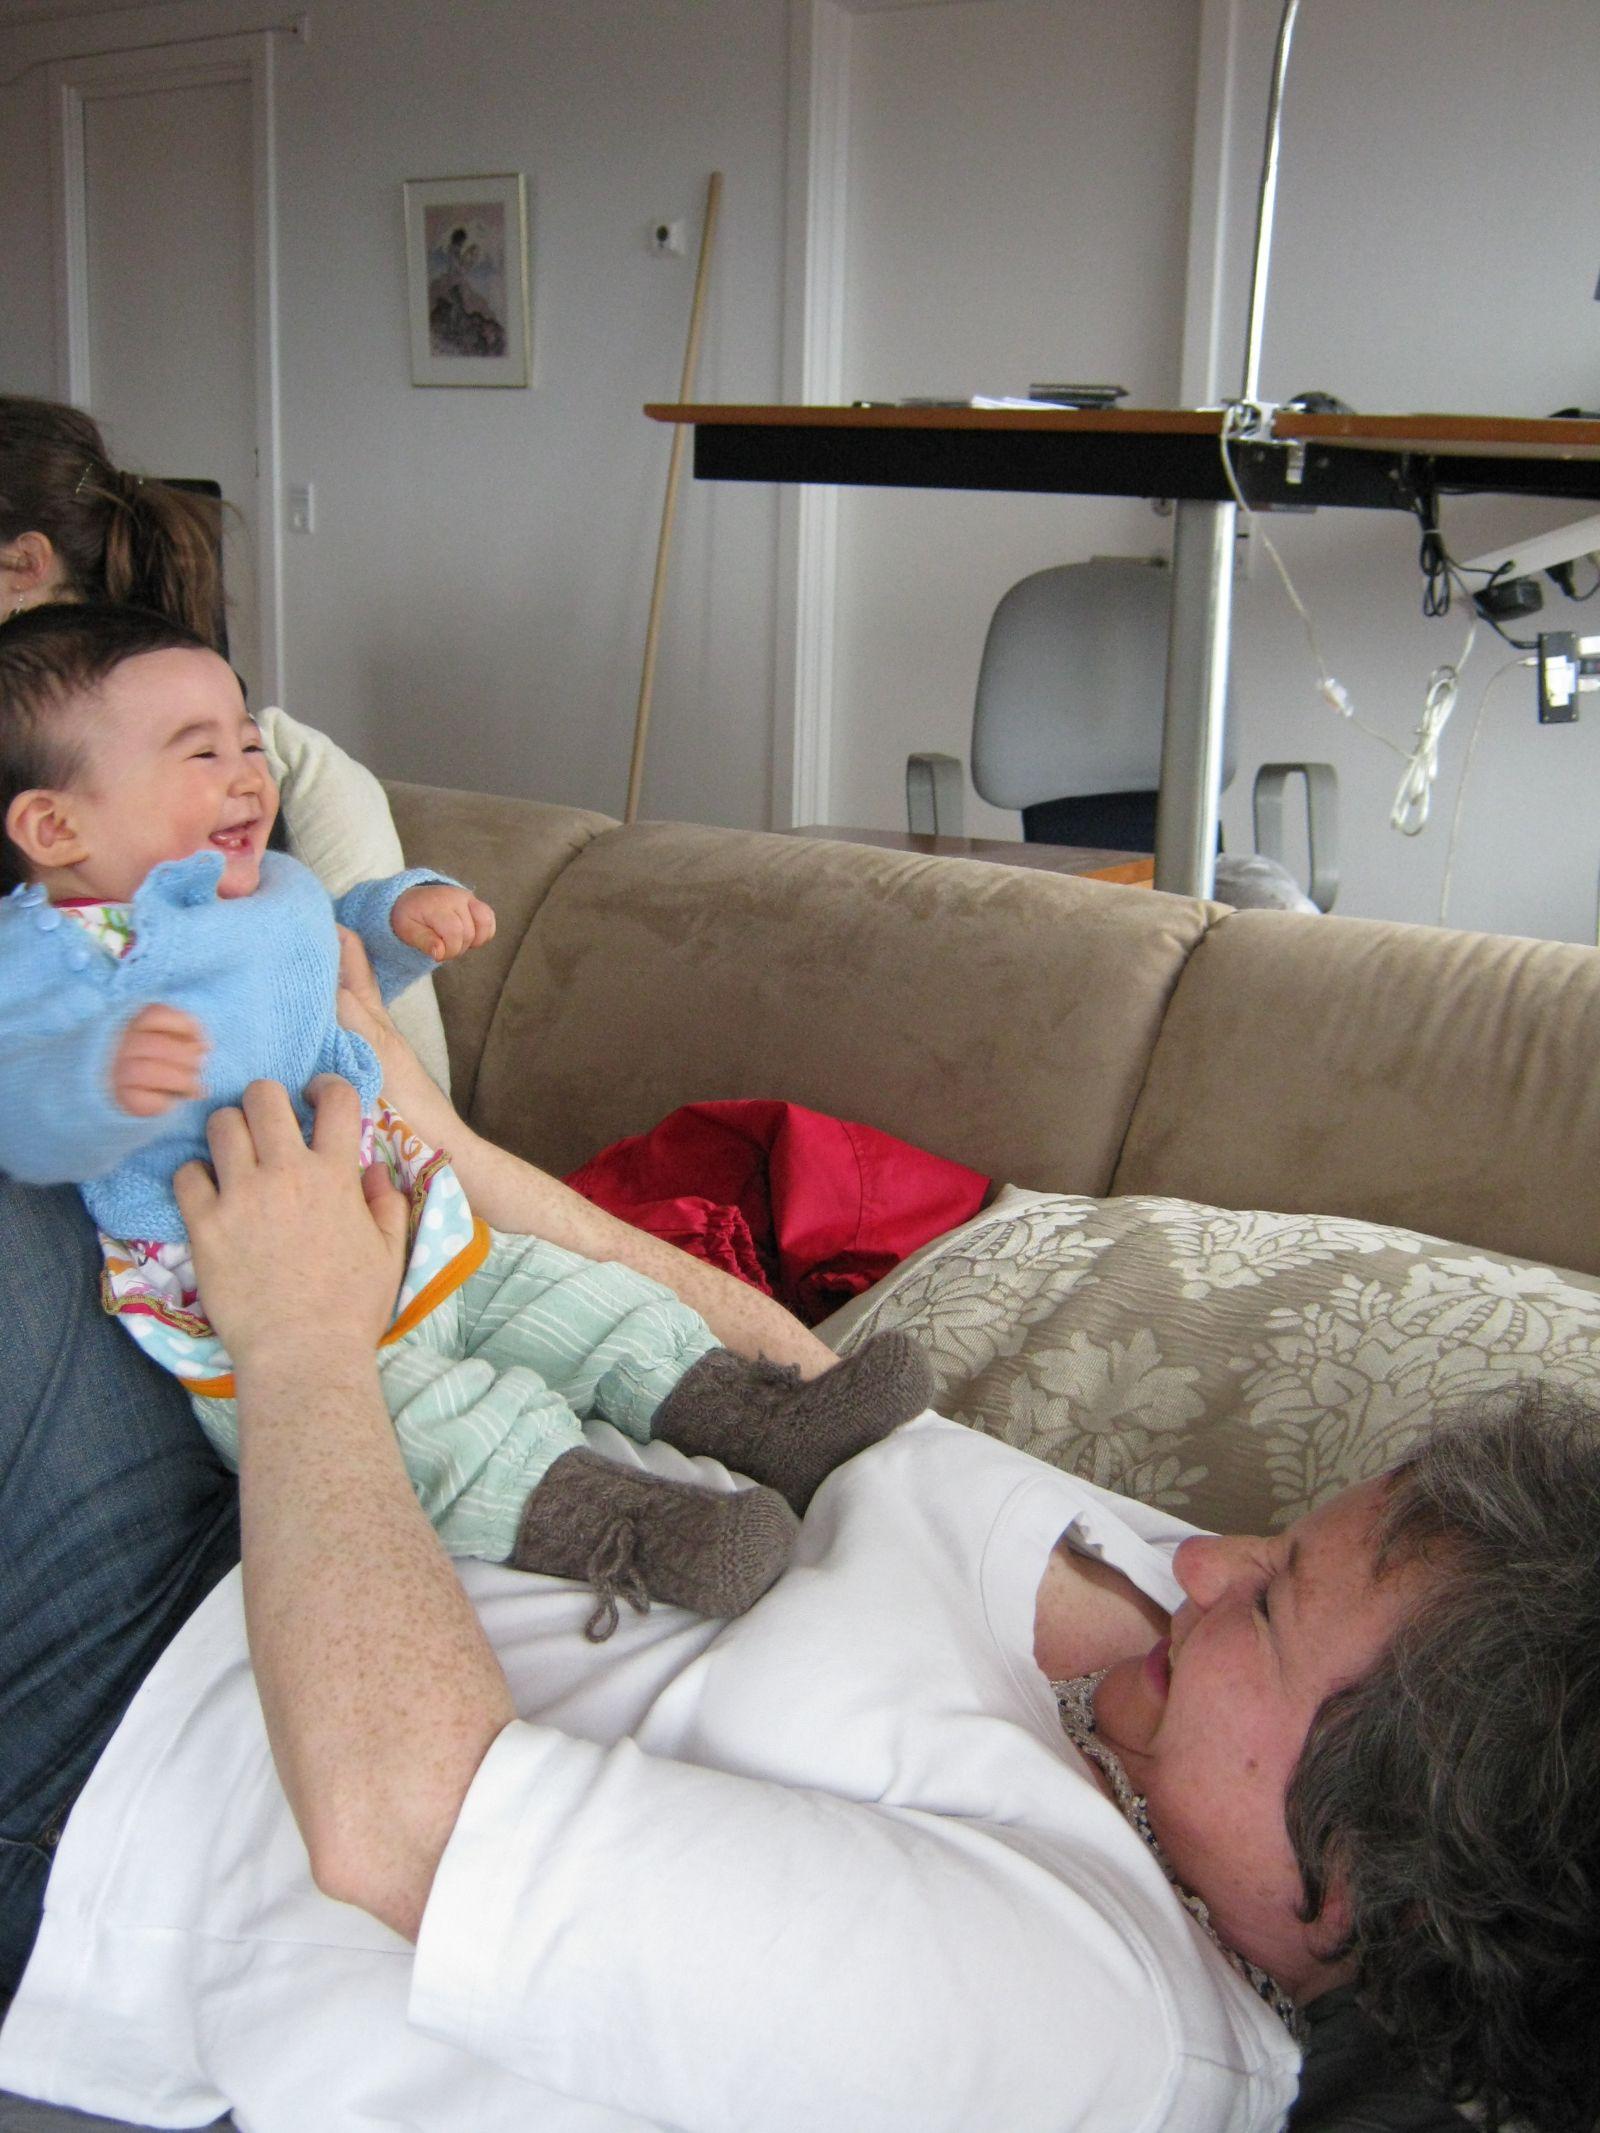 2009-06-21-0959_Mette Labansen; Qupanuk Eugenius Labansen